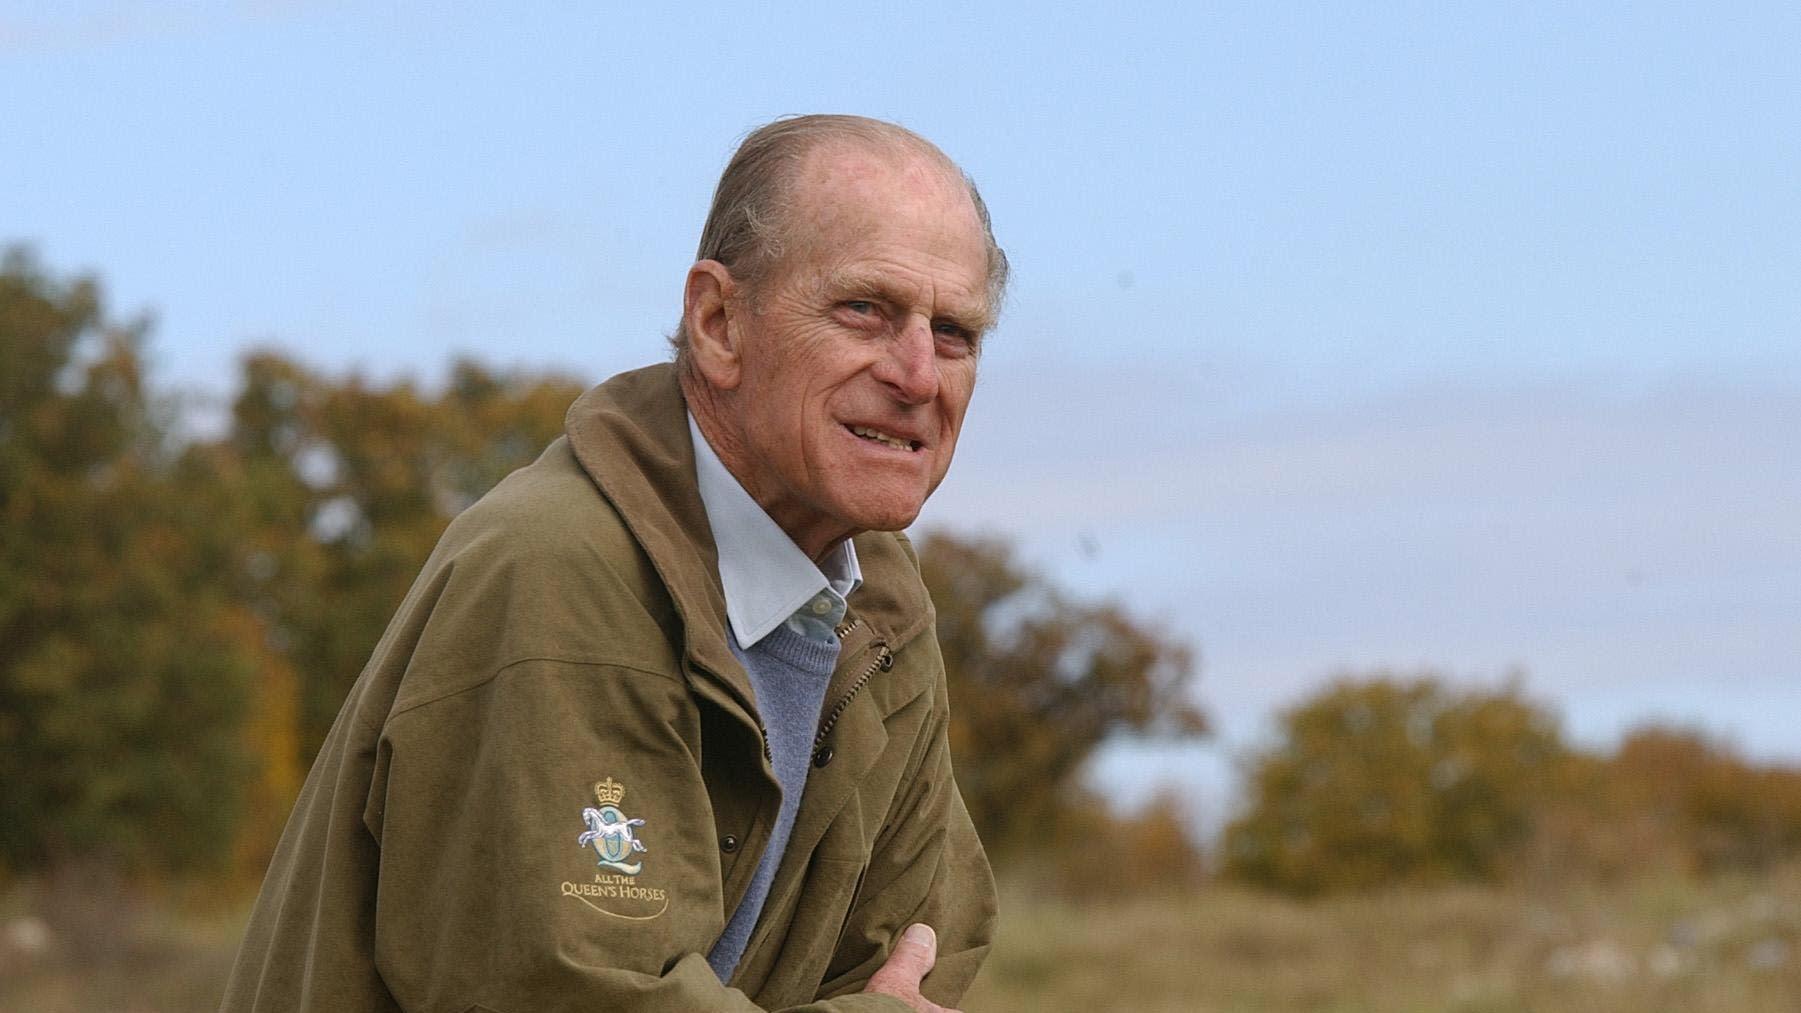 Celebrities recall happy times with the Duke of Edinburgh